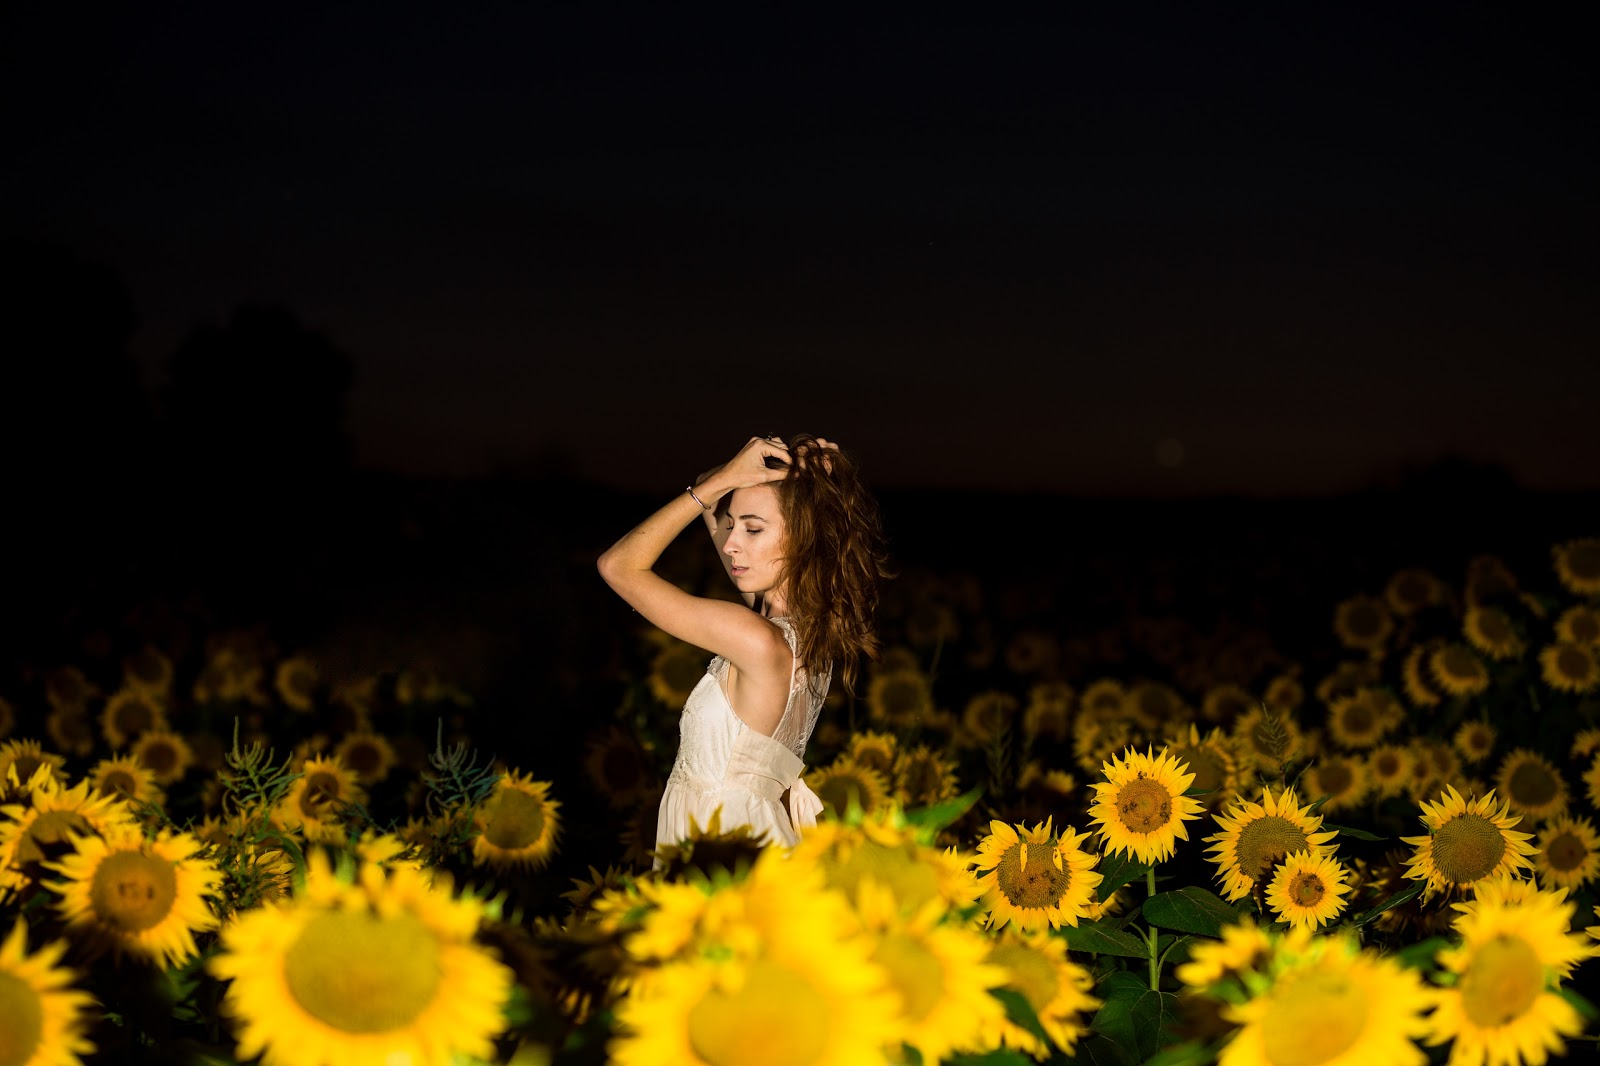 eGolden Moments Photography sunflower field photos